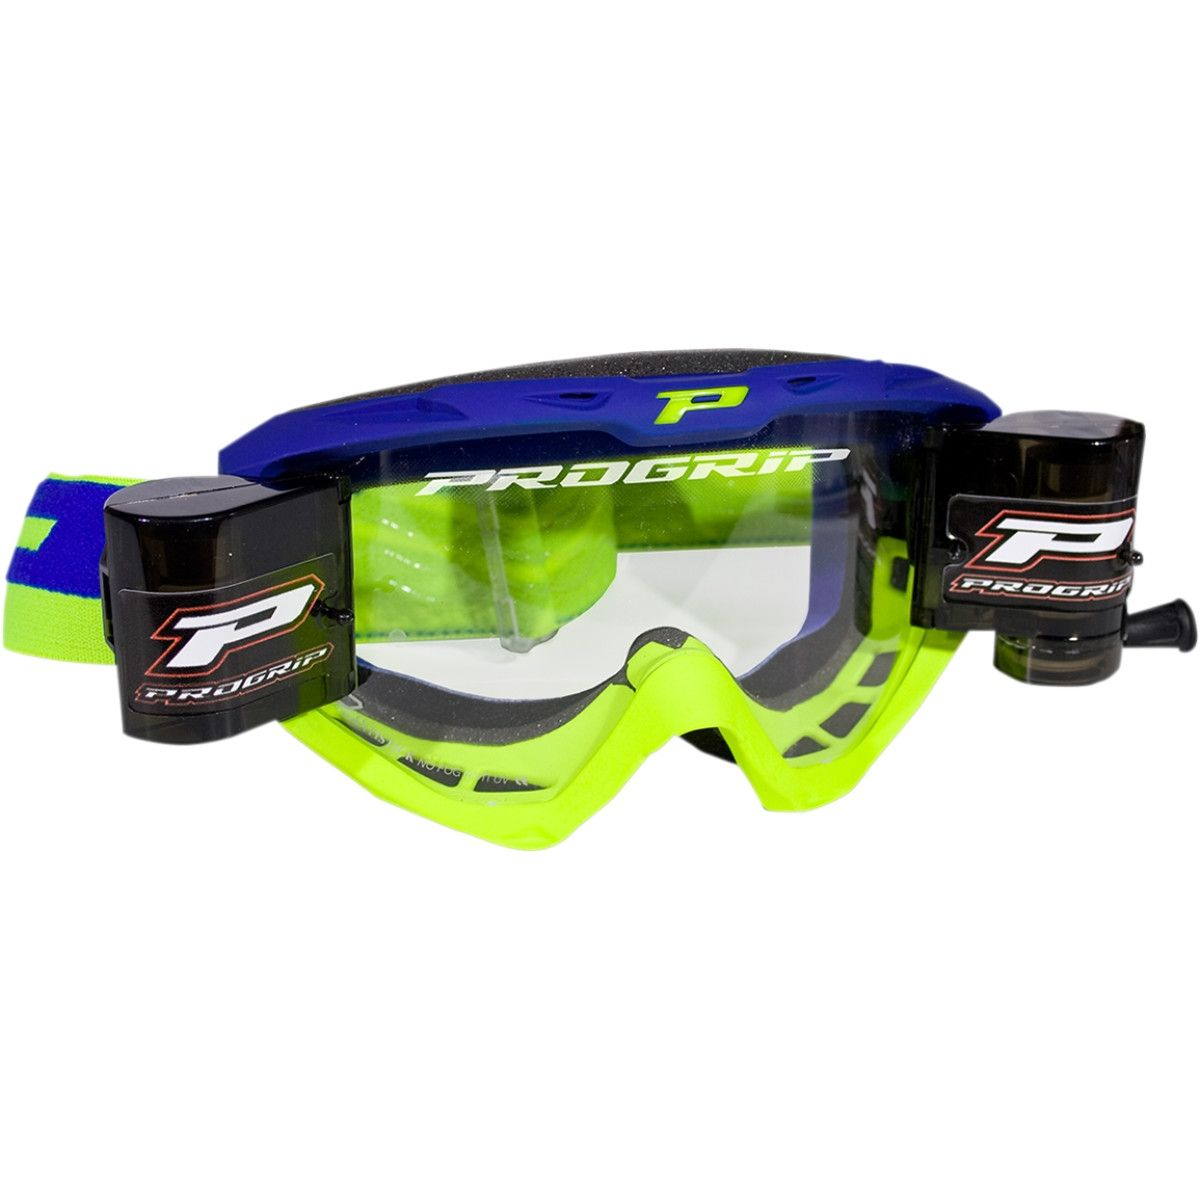 Progrip Crossbril 3450 Roll-Off fluor geel/blauw